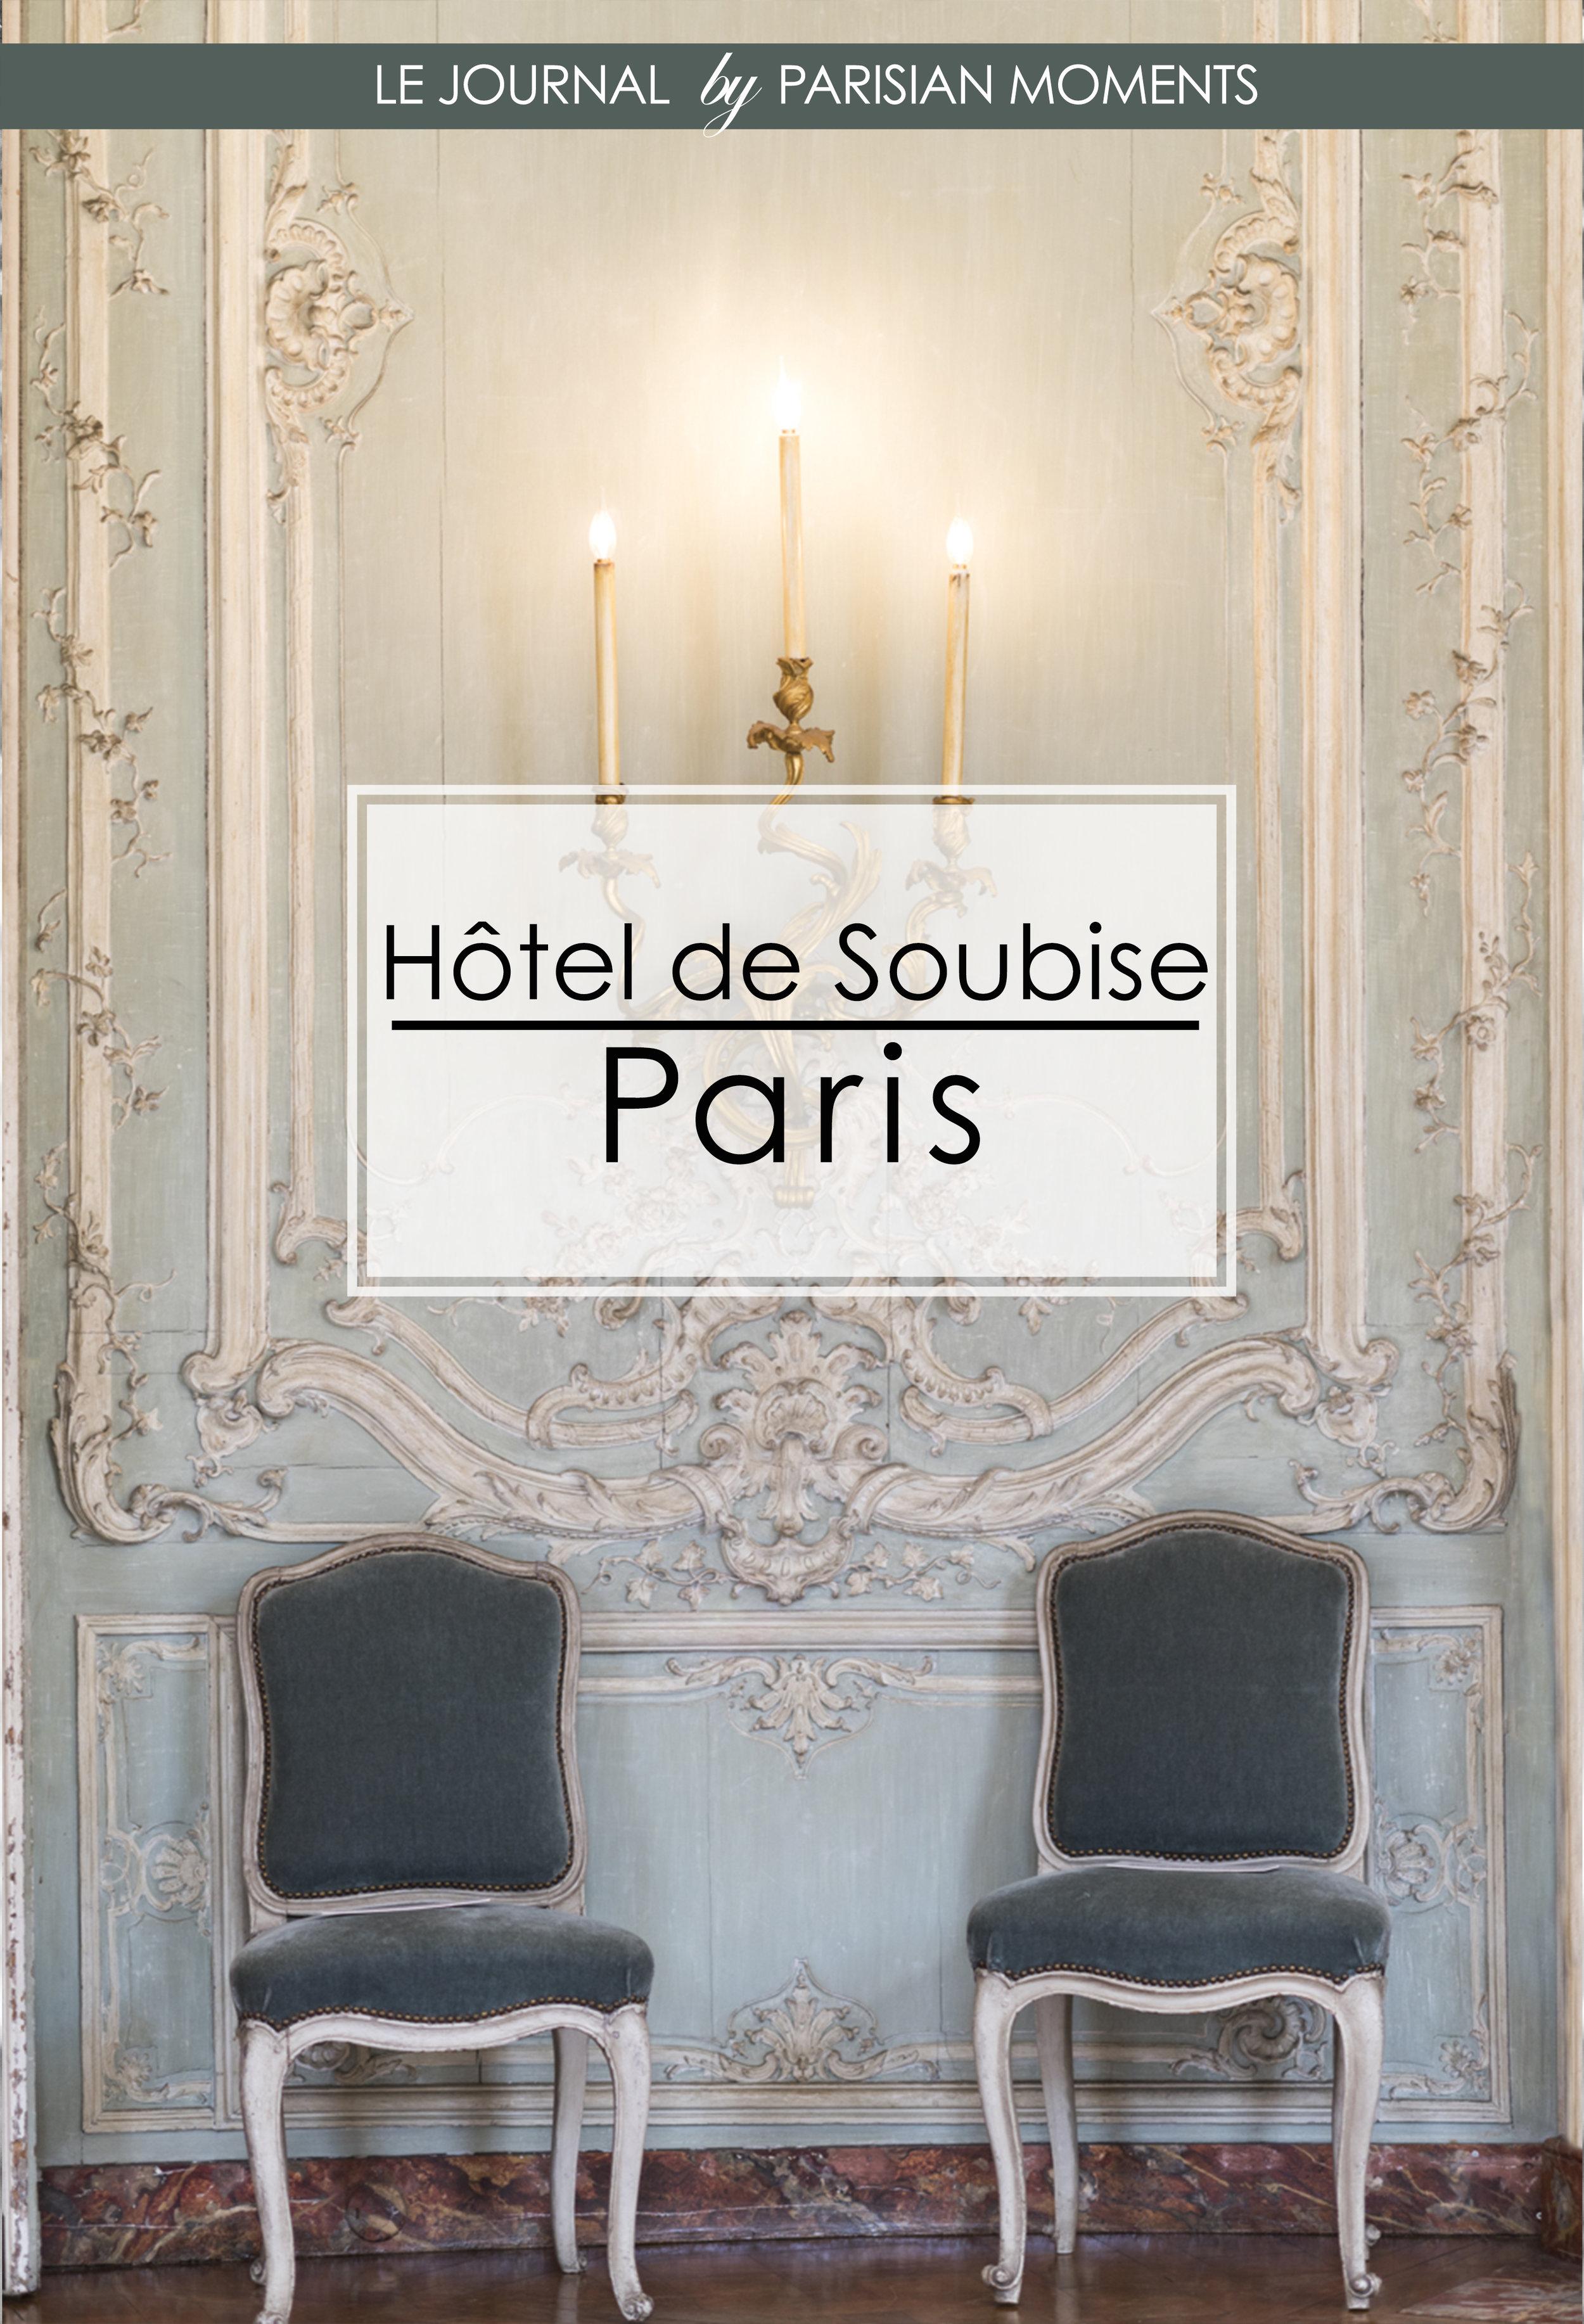 HoteldeSoubise Cover.jpg